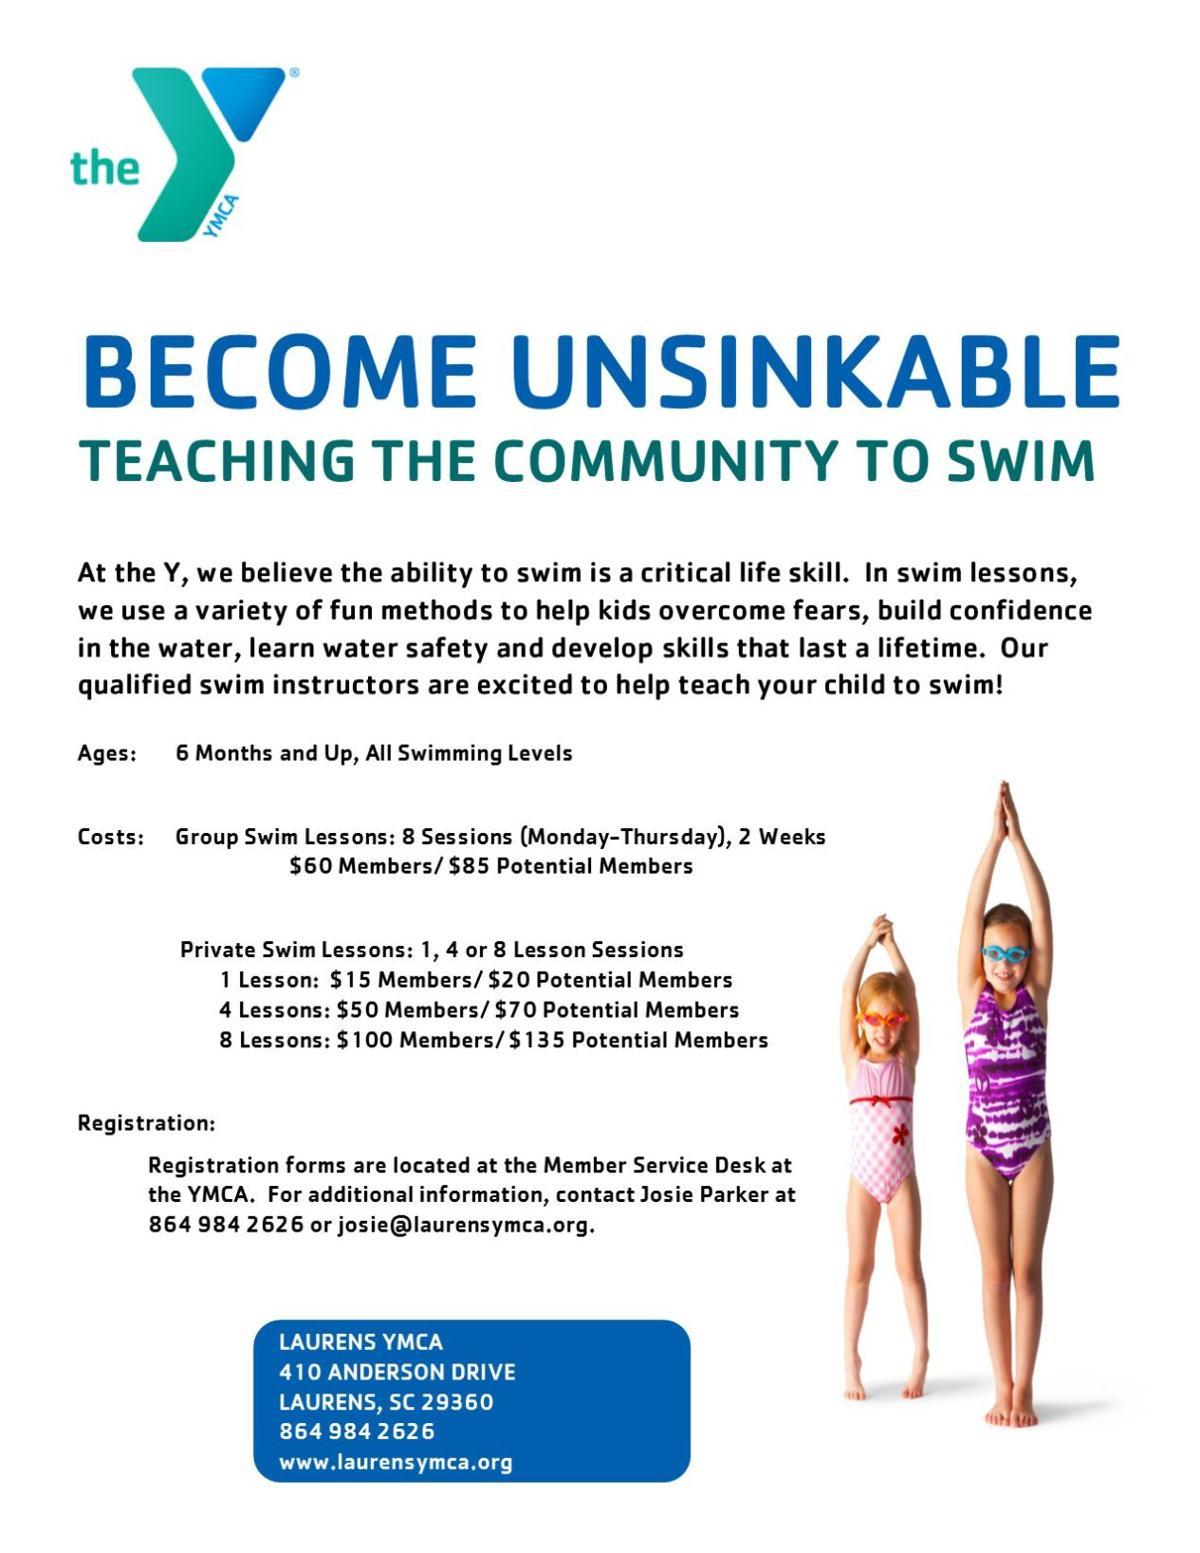 Laurens YMCA offering variety of summer programs | News